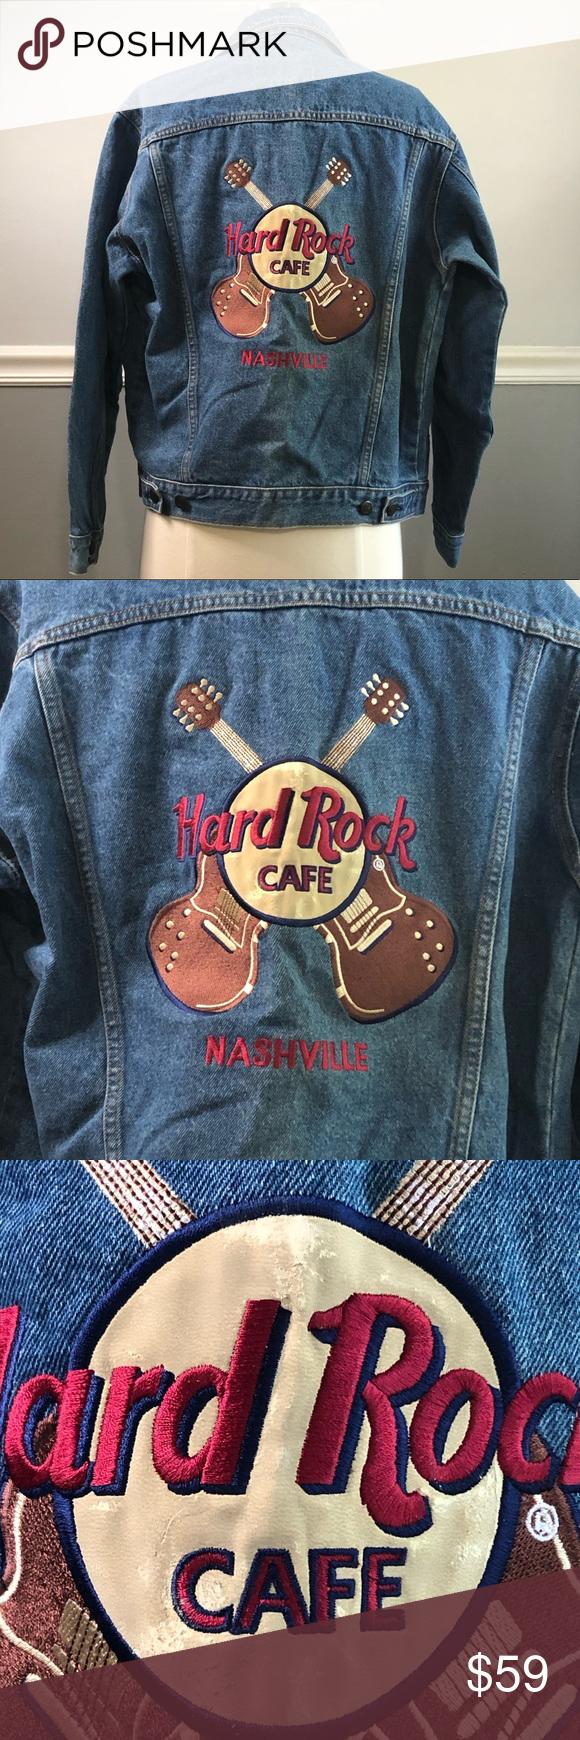 Hard Rock Cafe Nashville Guitar Logo Jean Jacket Cafe Jacket Jackets Jean Jacket [ 1740 x 580 Pixel ]